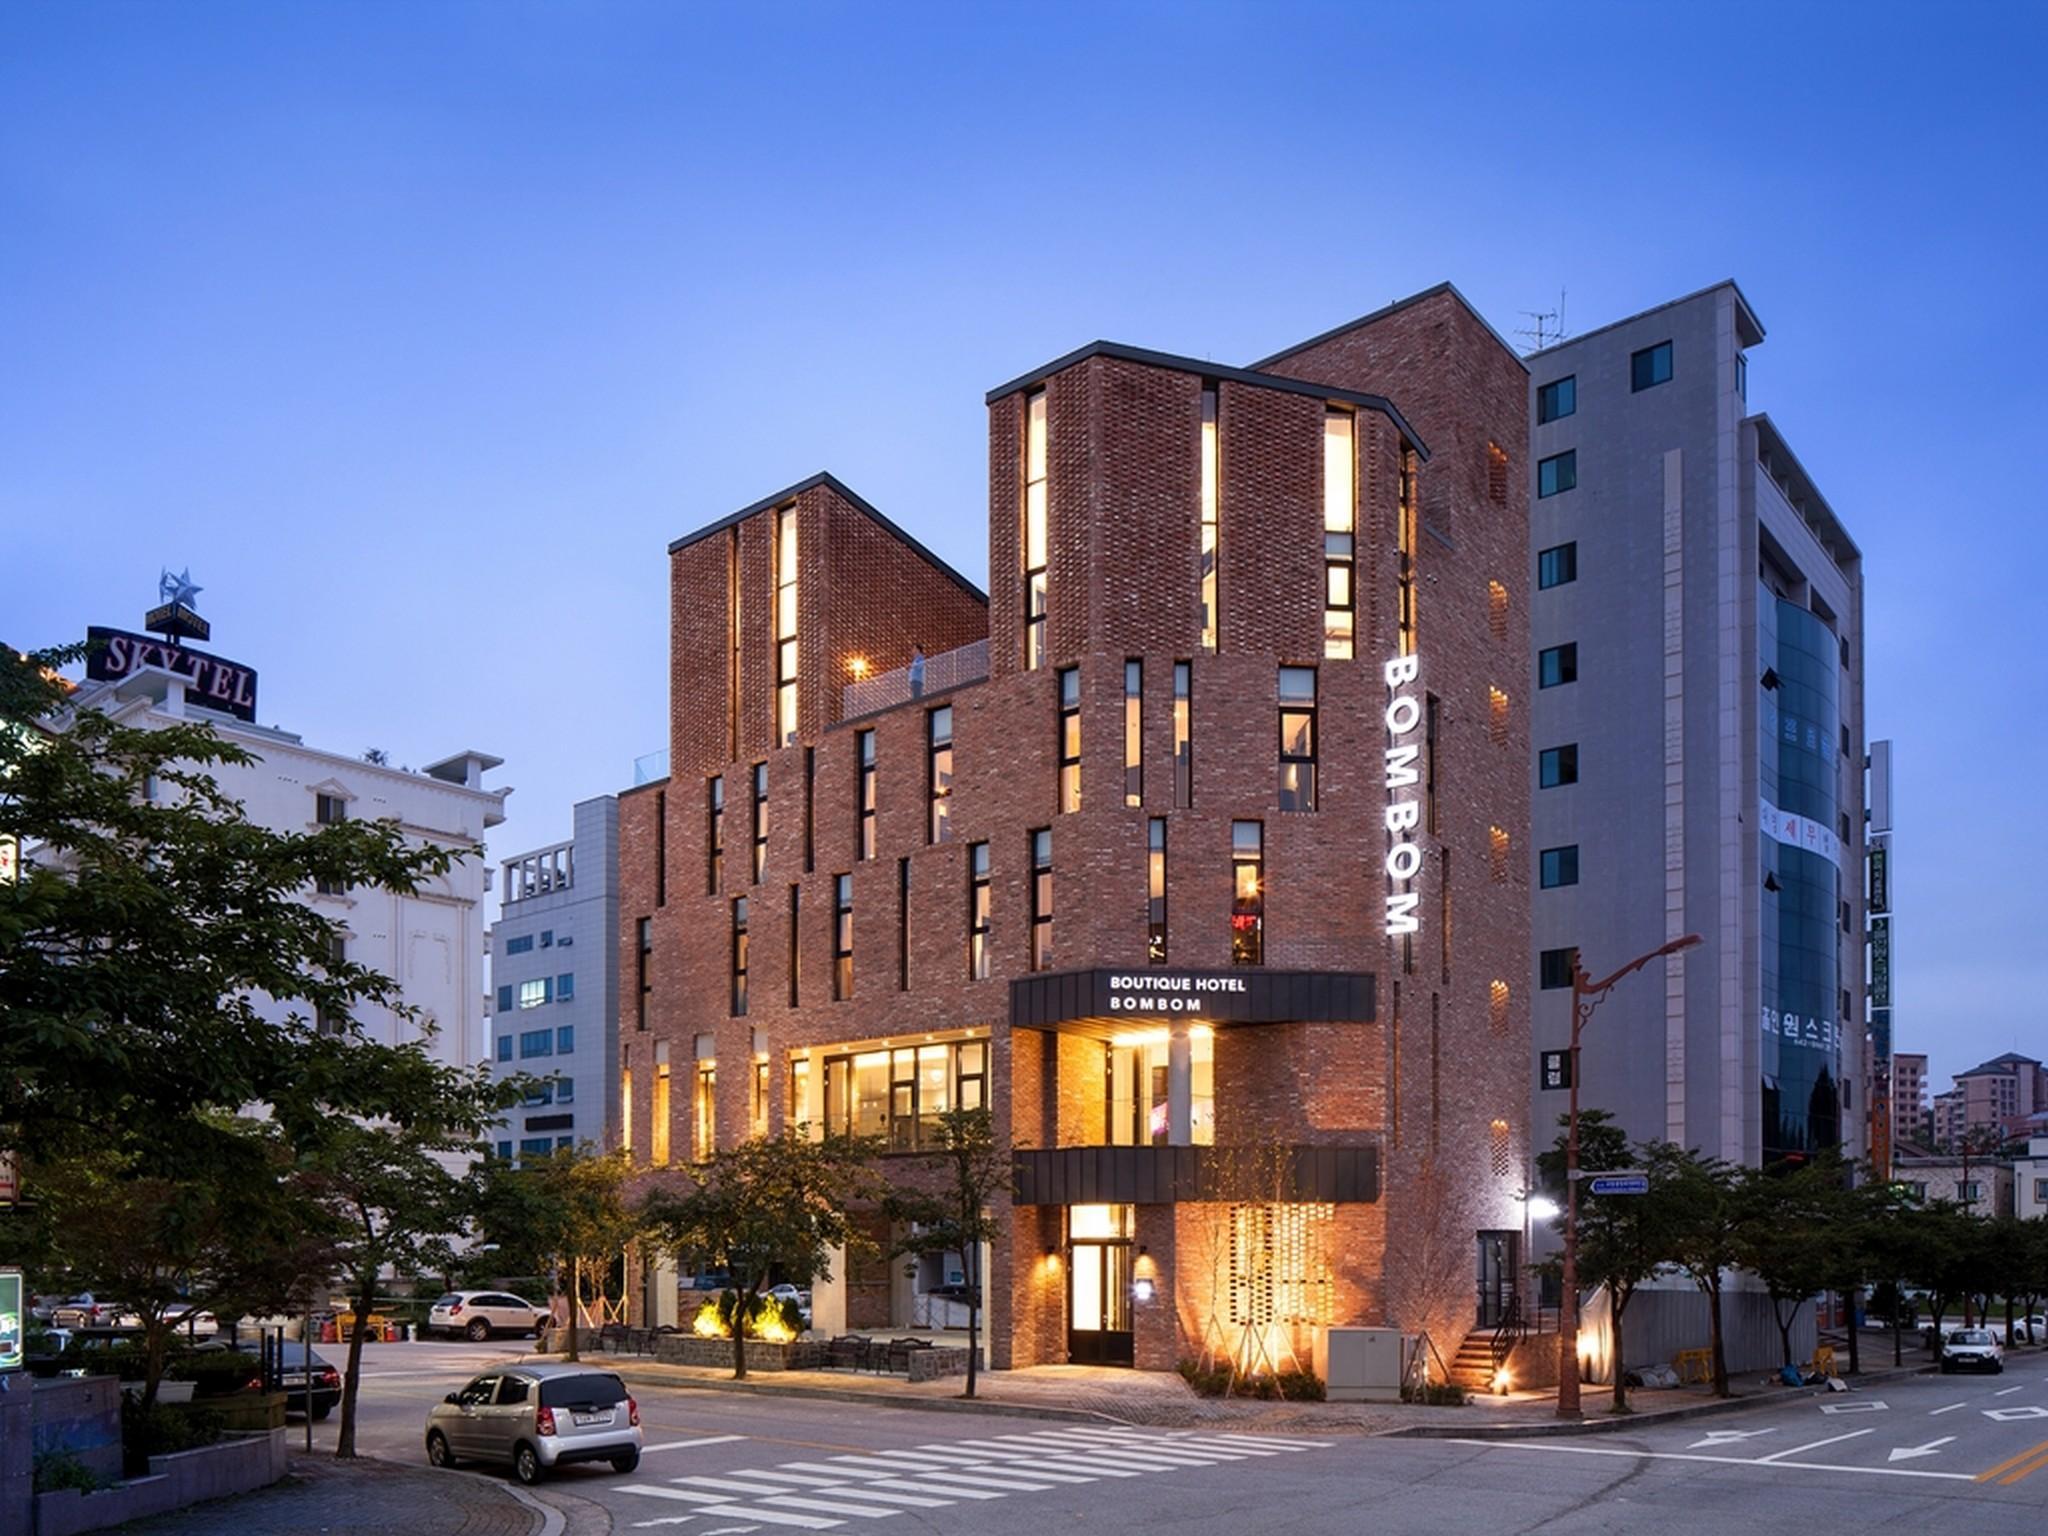 Gangneung Boutique Hotel Bombom